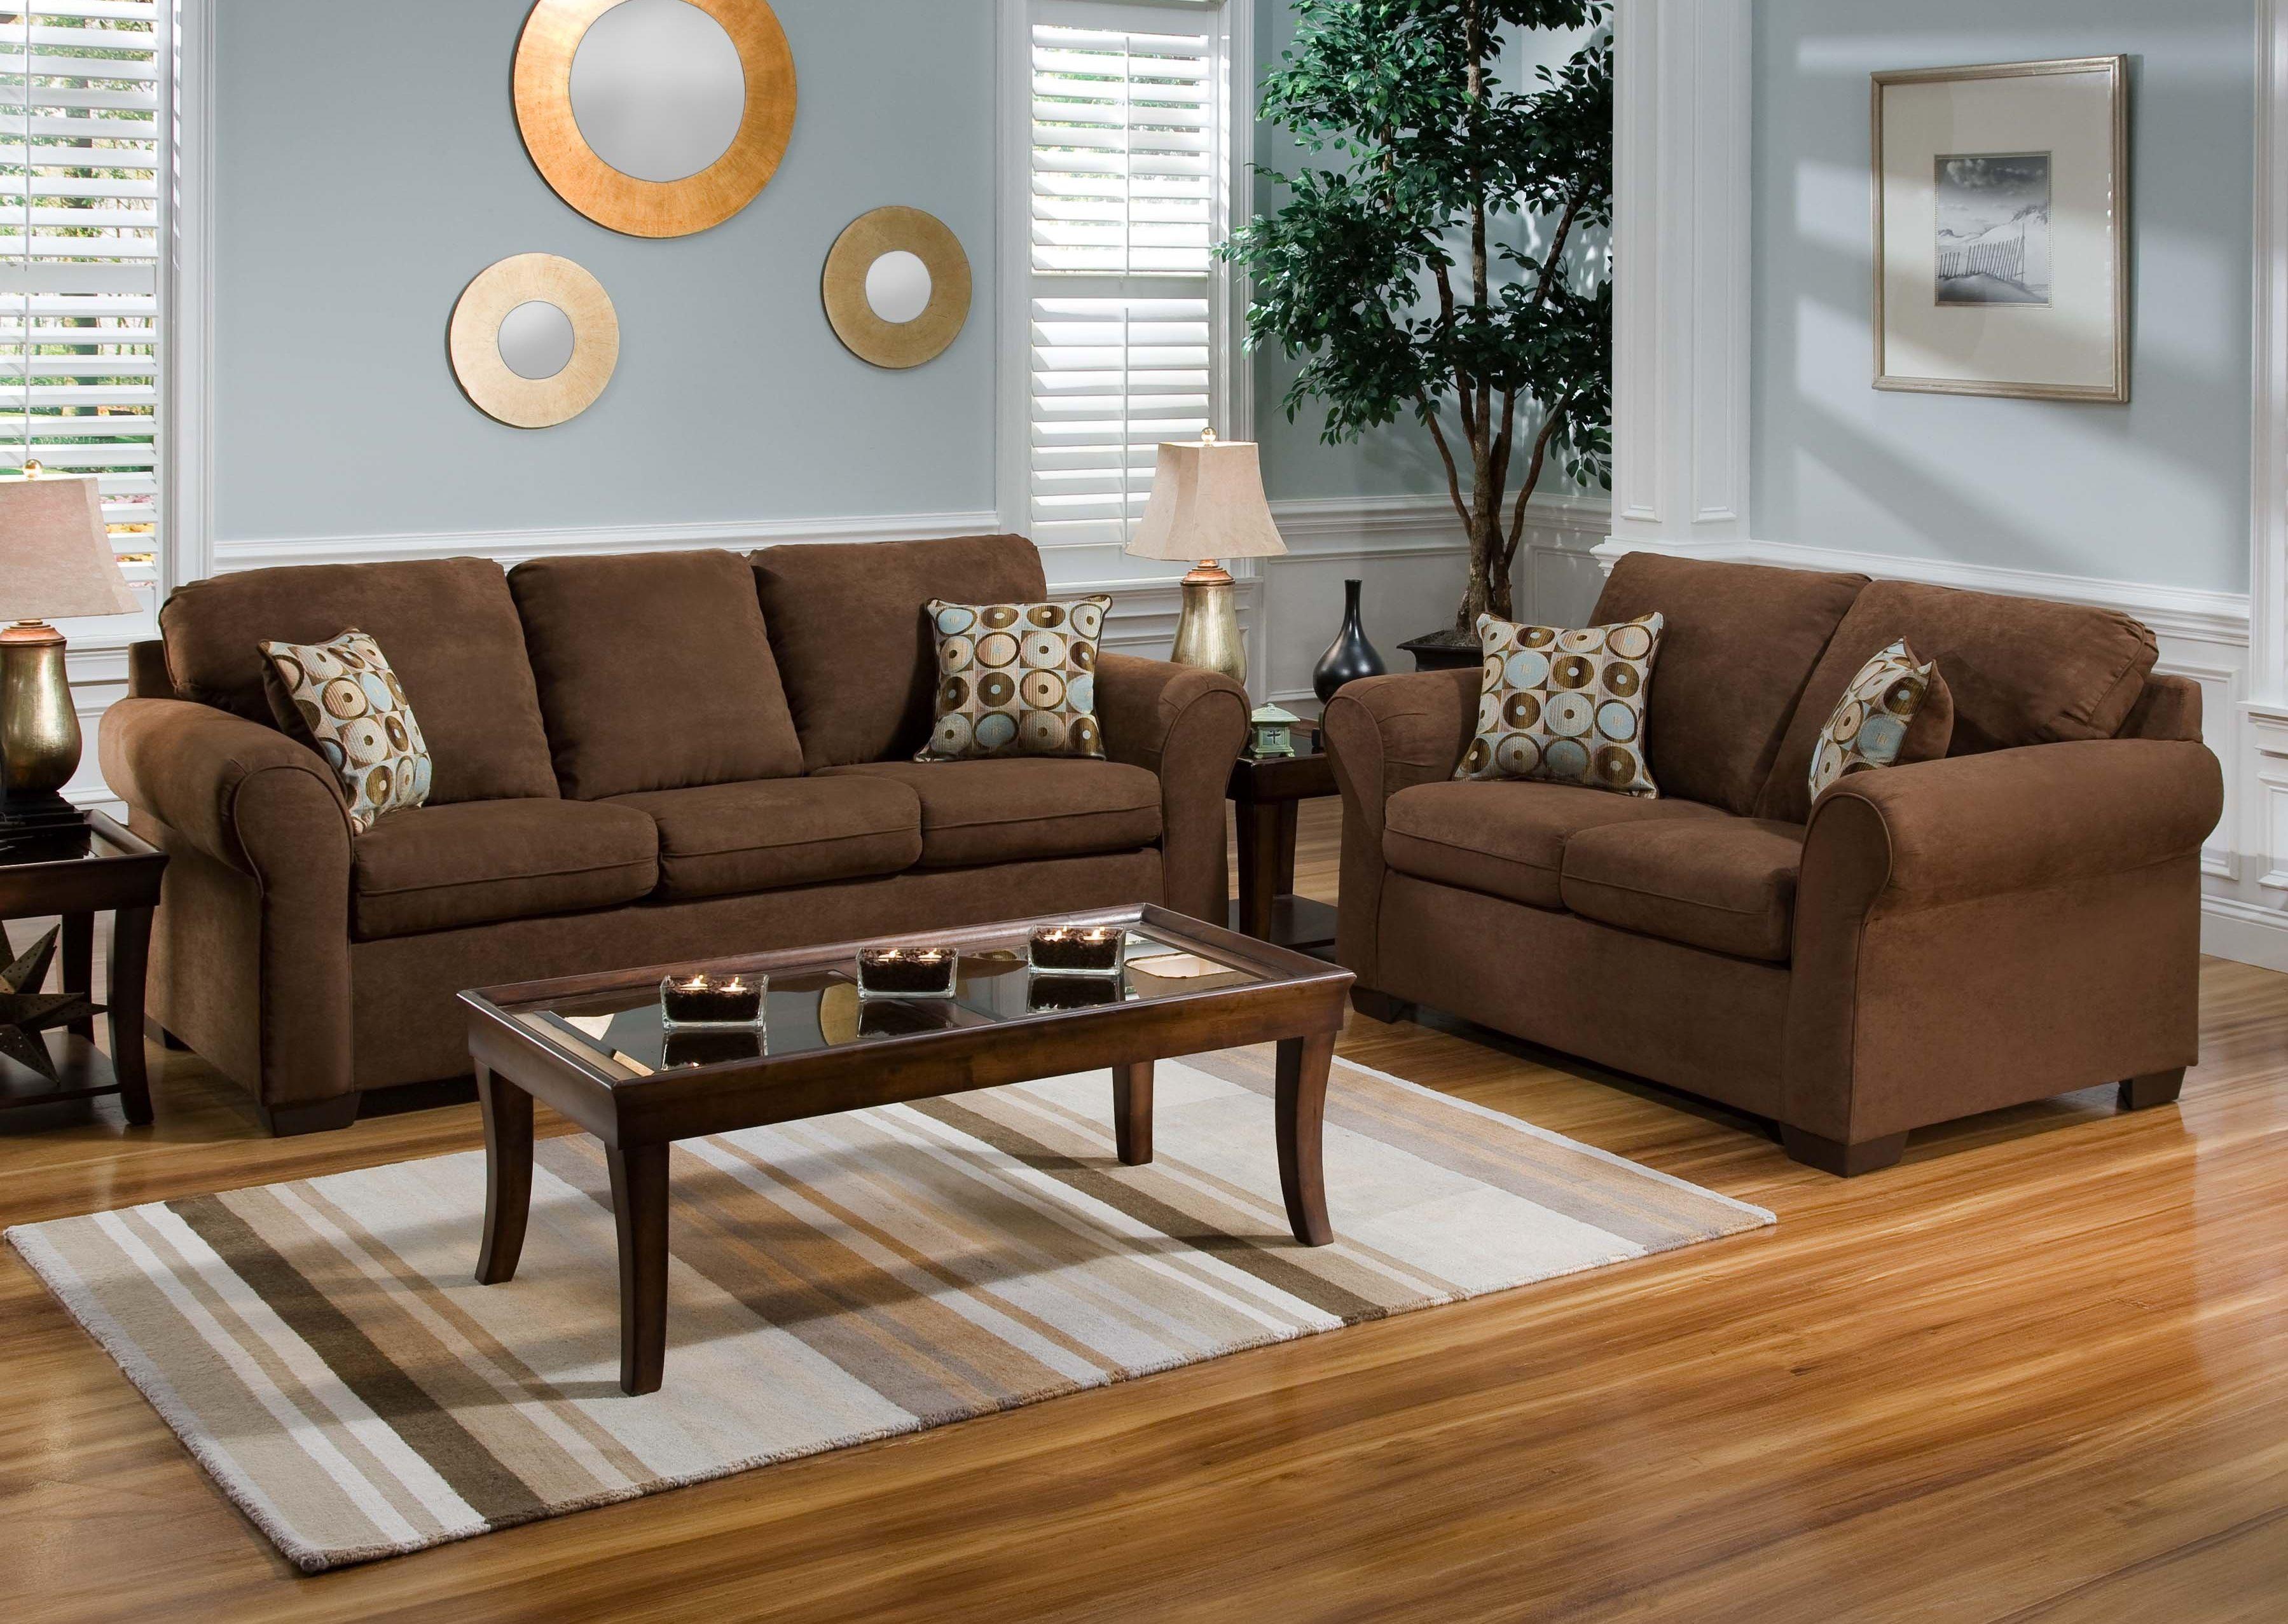 best 25+ brown sofa decor ideas on pinterest | living room decor